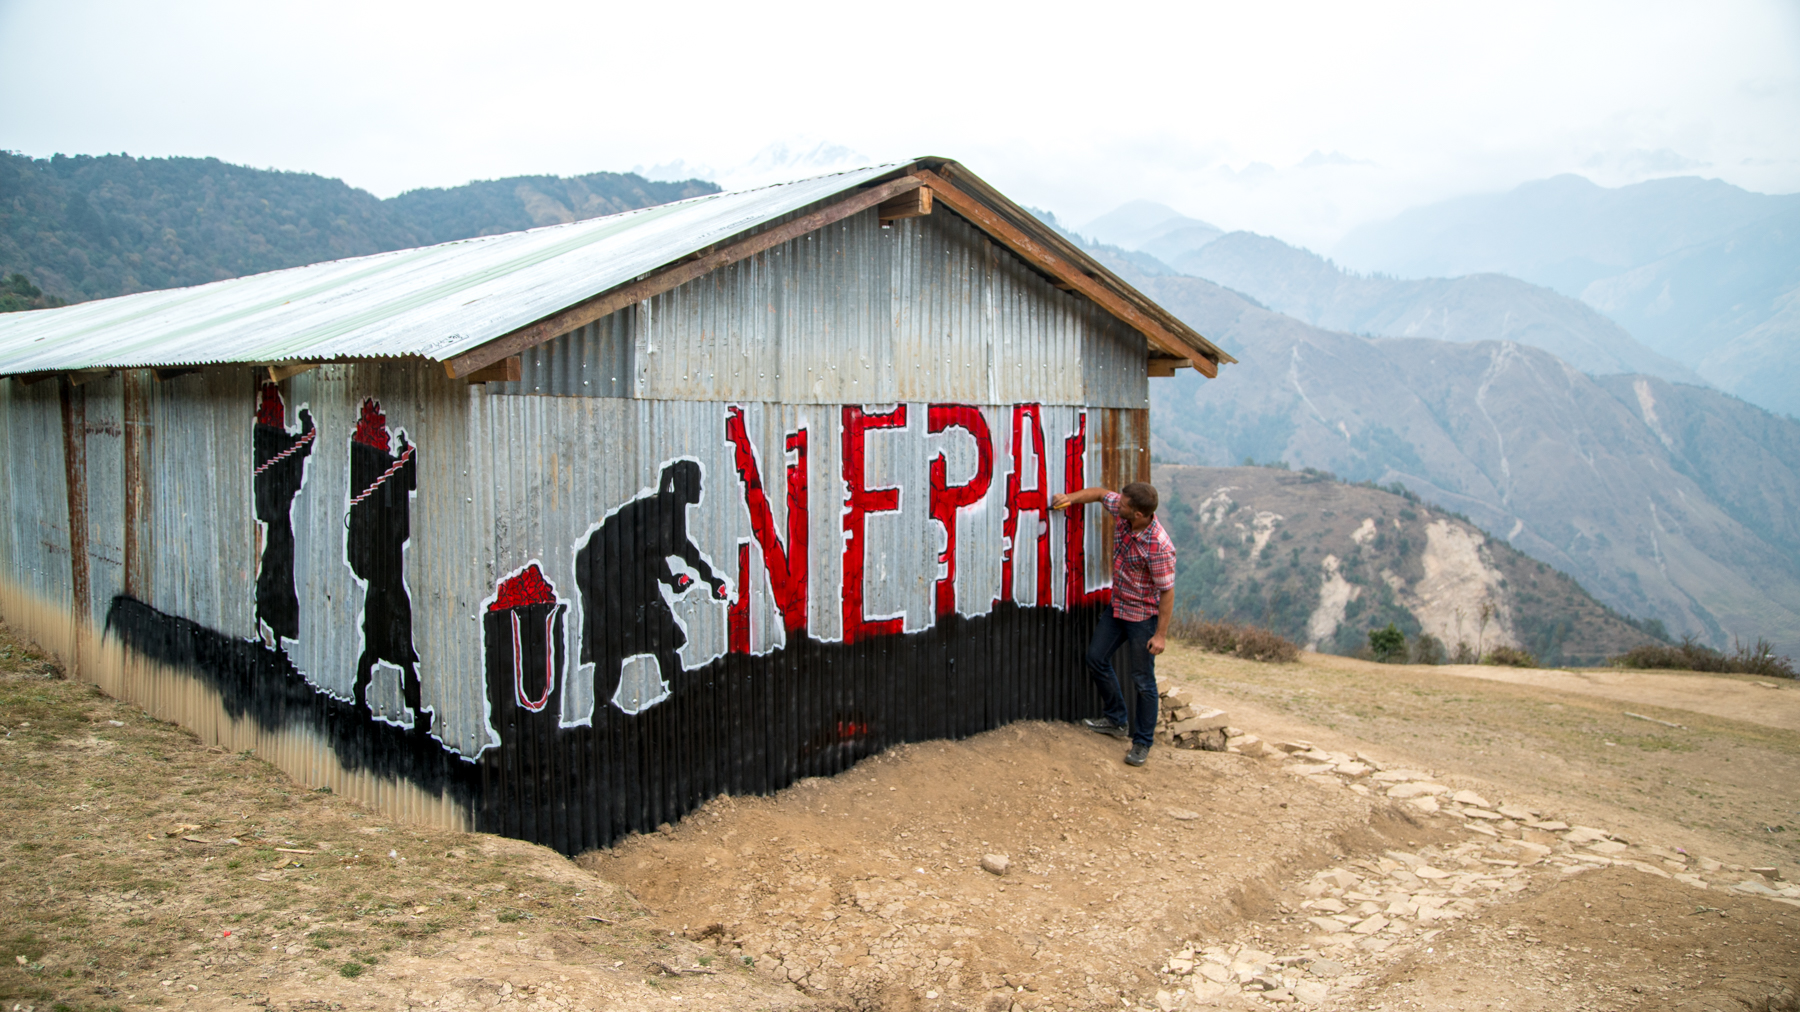 2015_11_28_Nepal_Day 11_A7R_Stills_0297.jpg